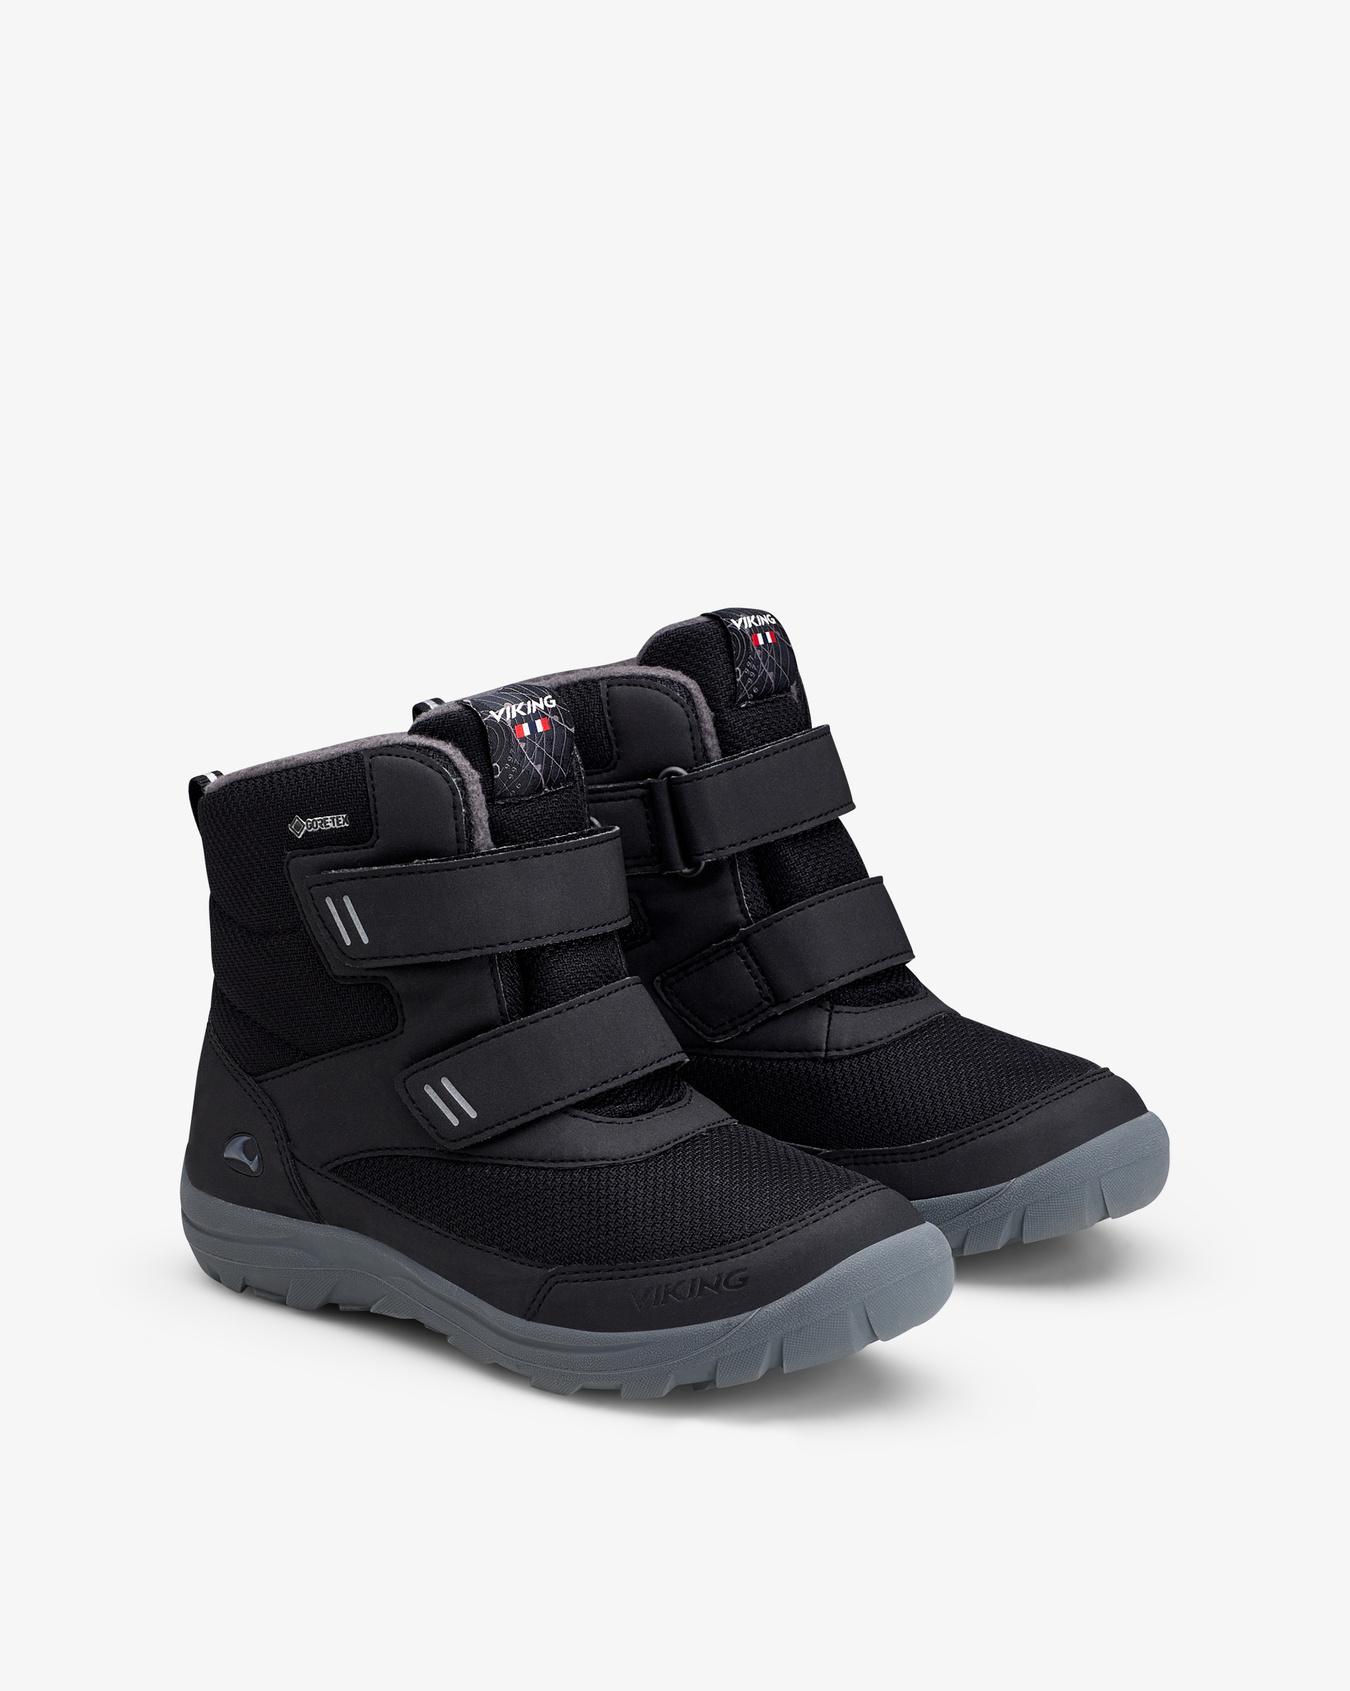 Vang Jr GTX Black Winter Boots